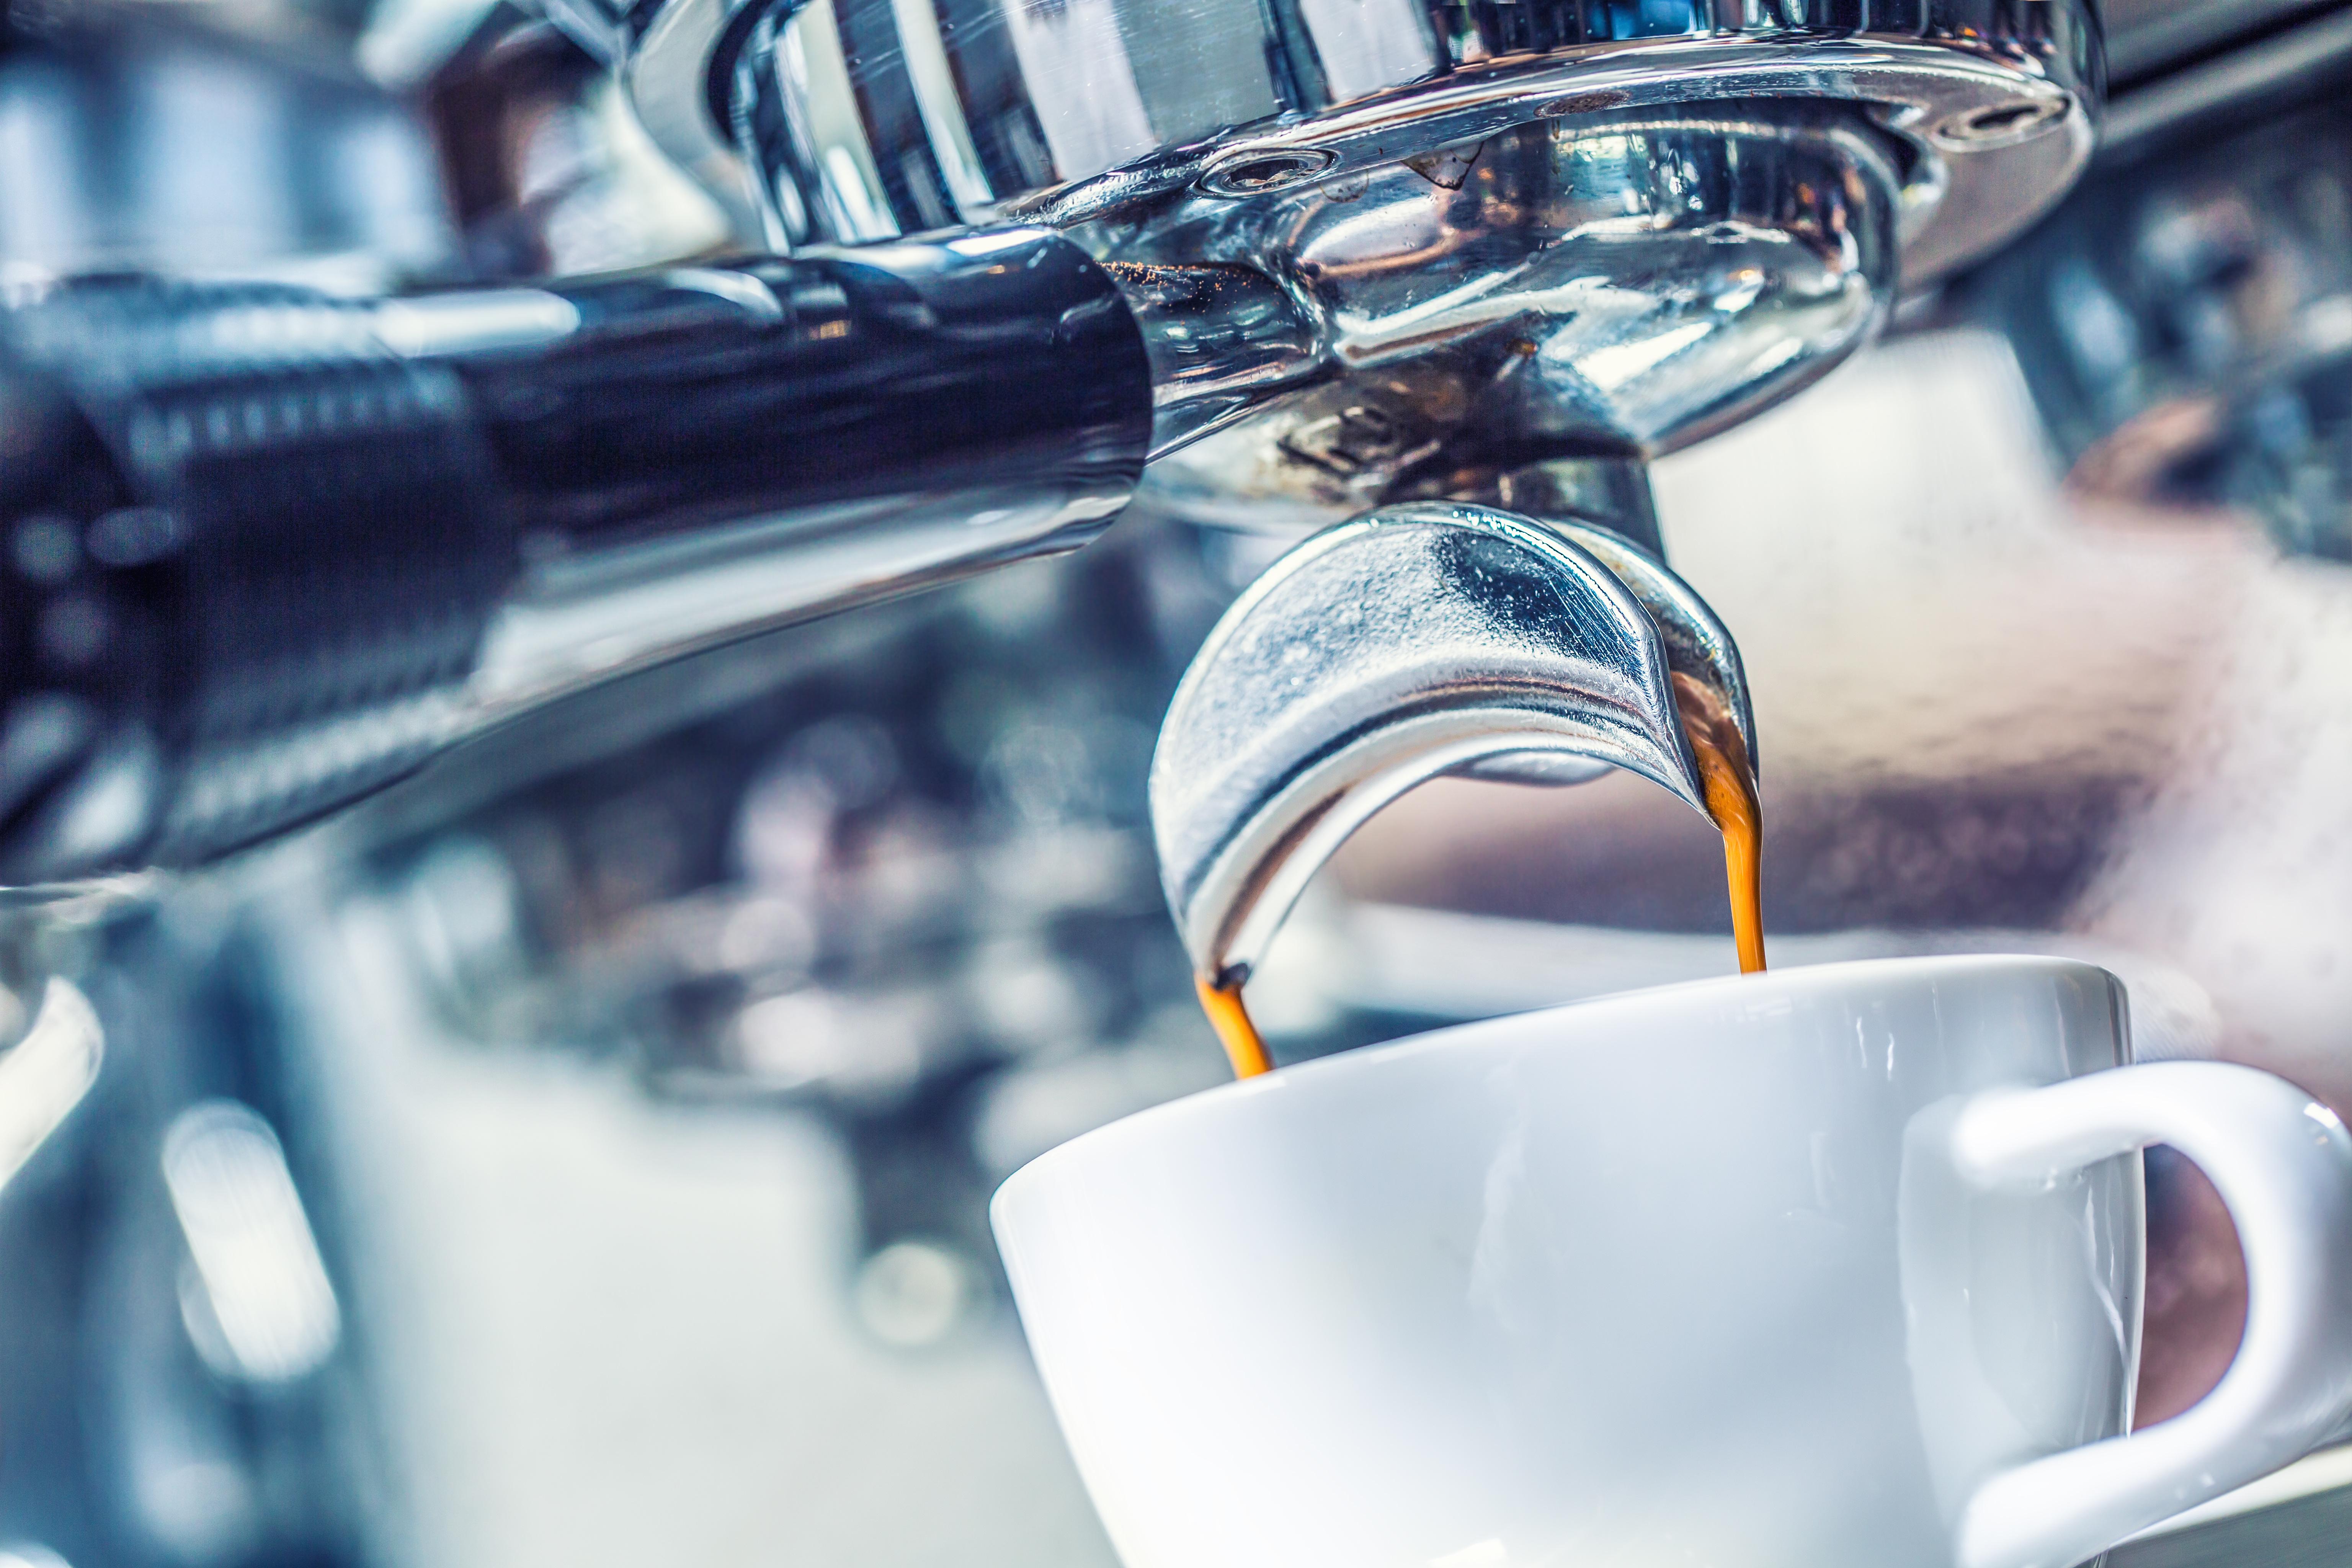 Coffeemachine